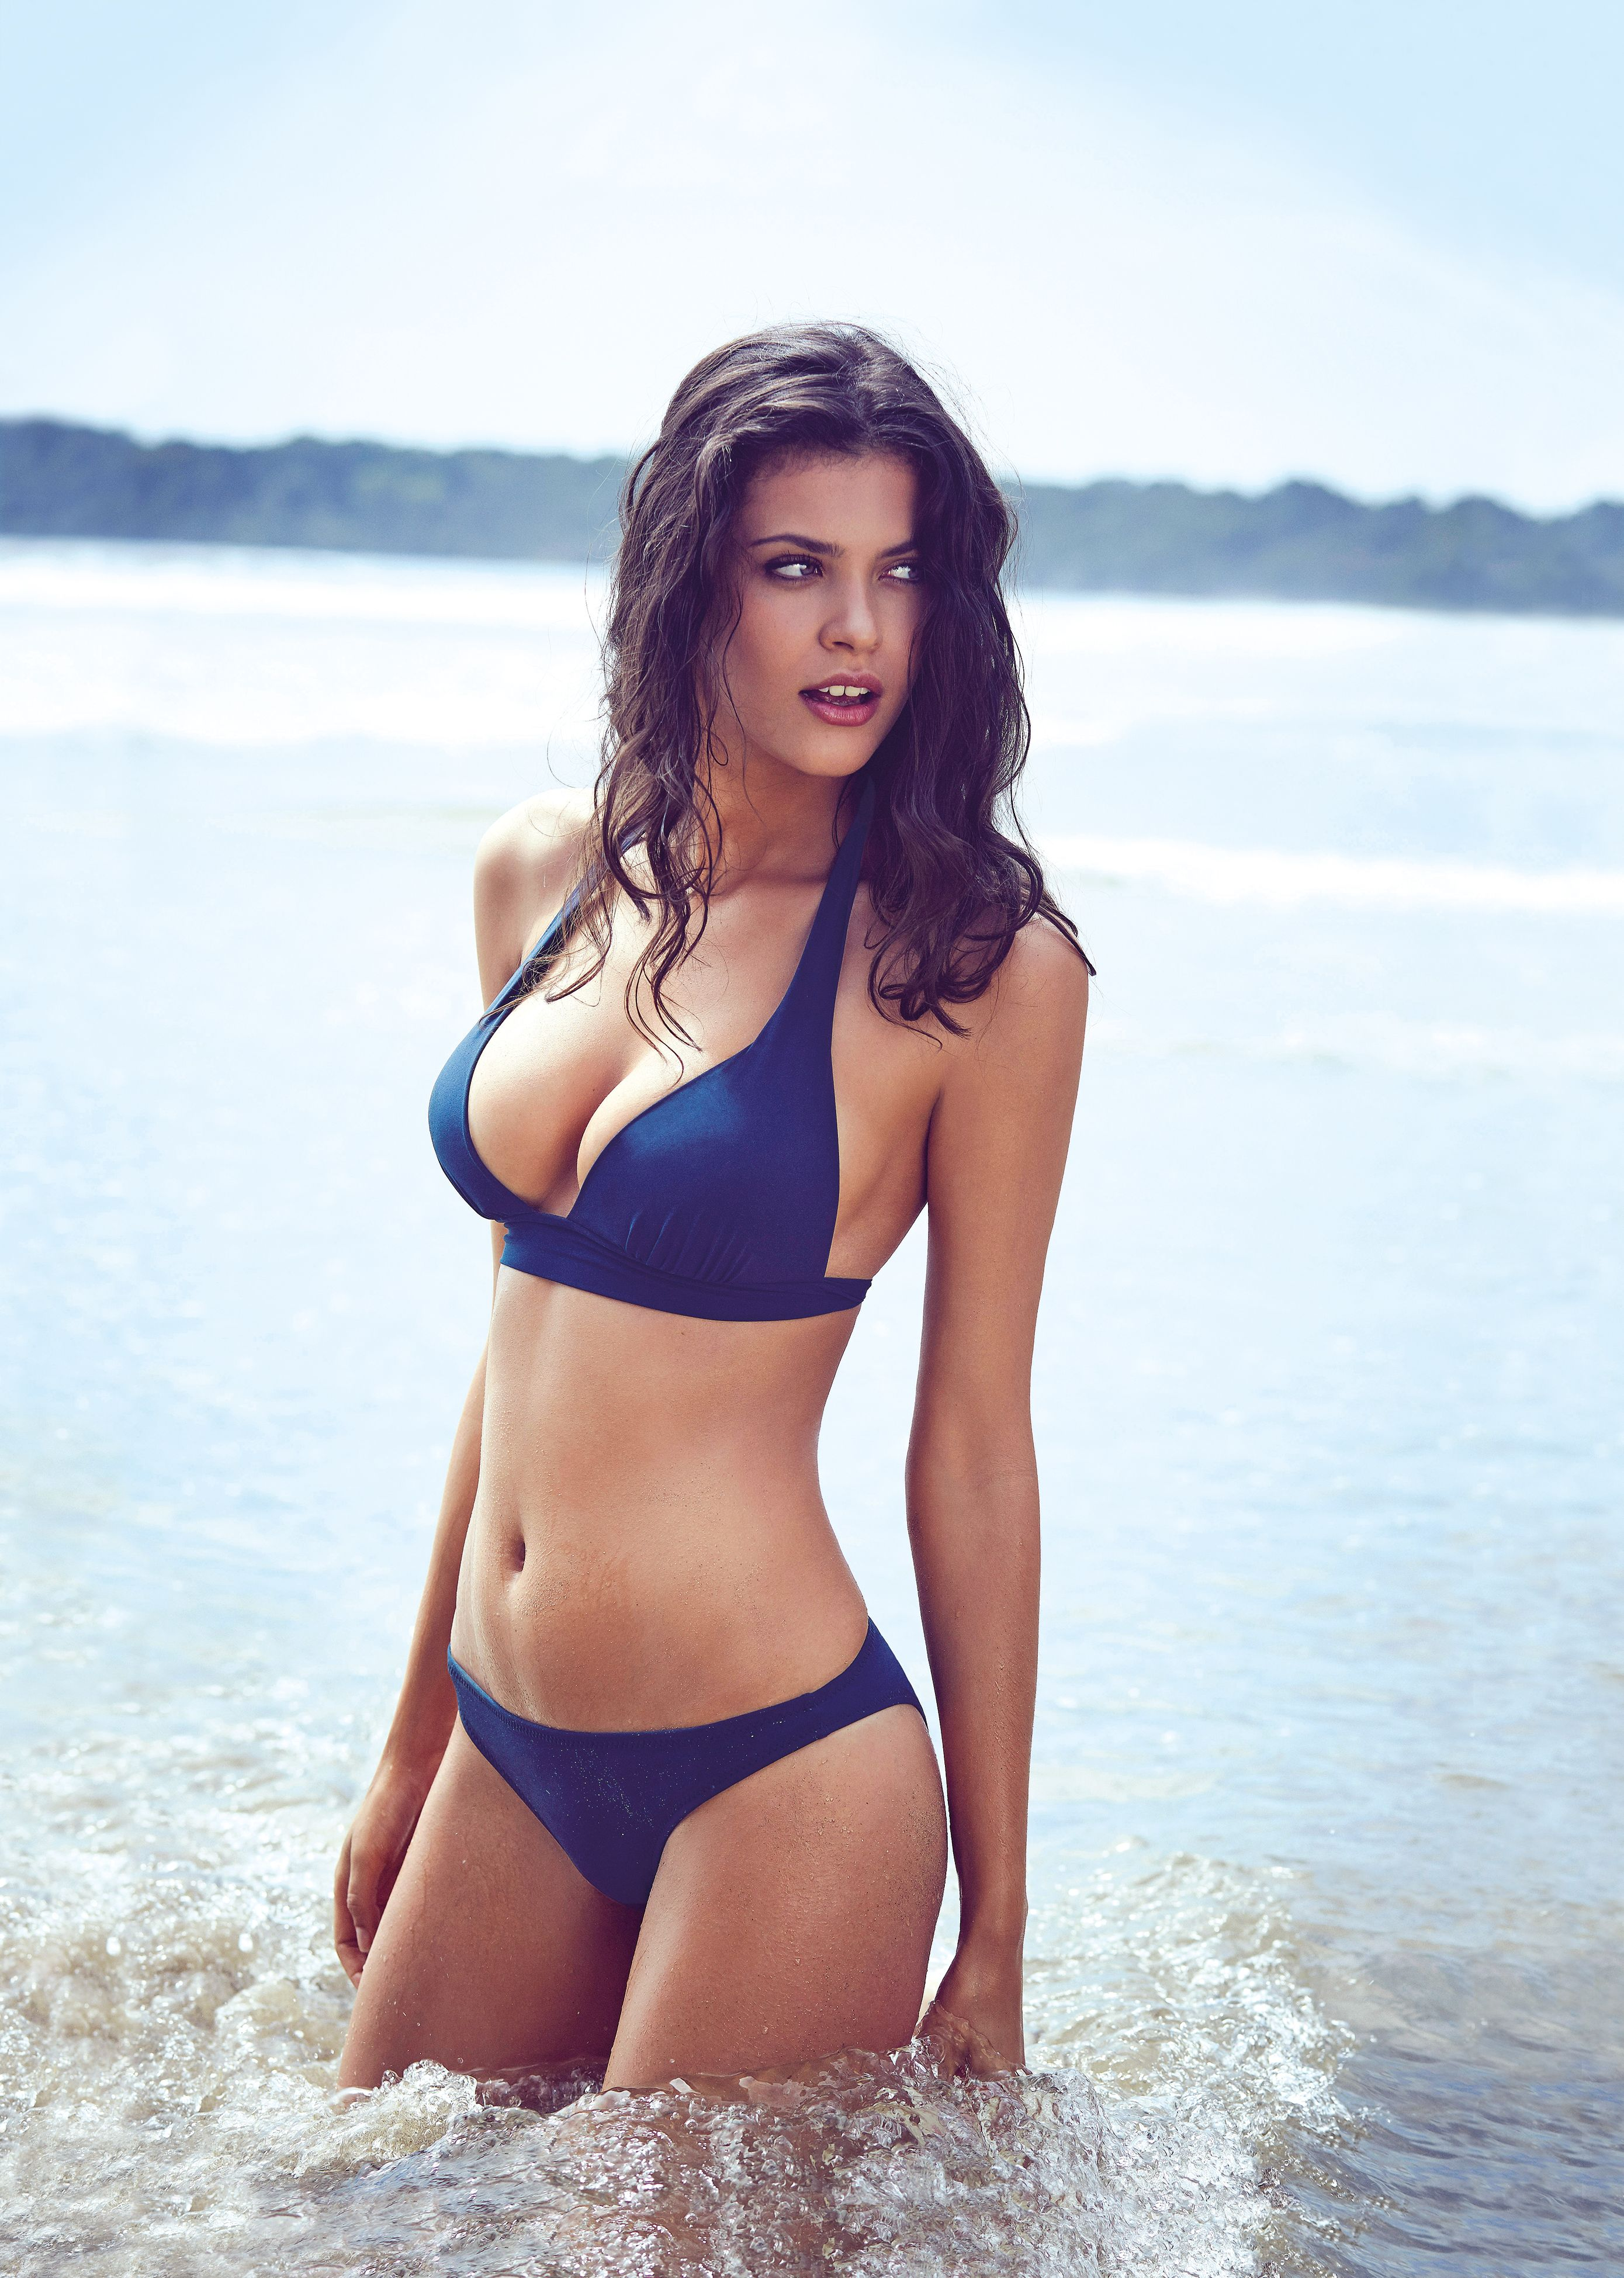 3a6641048b Pin by cj on Summer time | Bikinis, Bikini tops, Swimwear